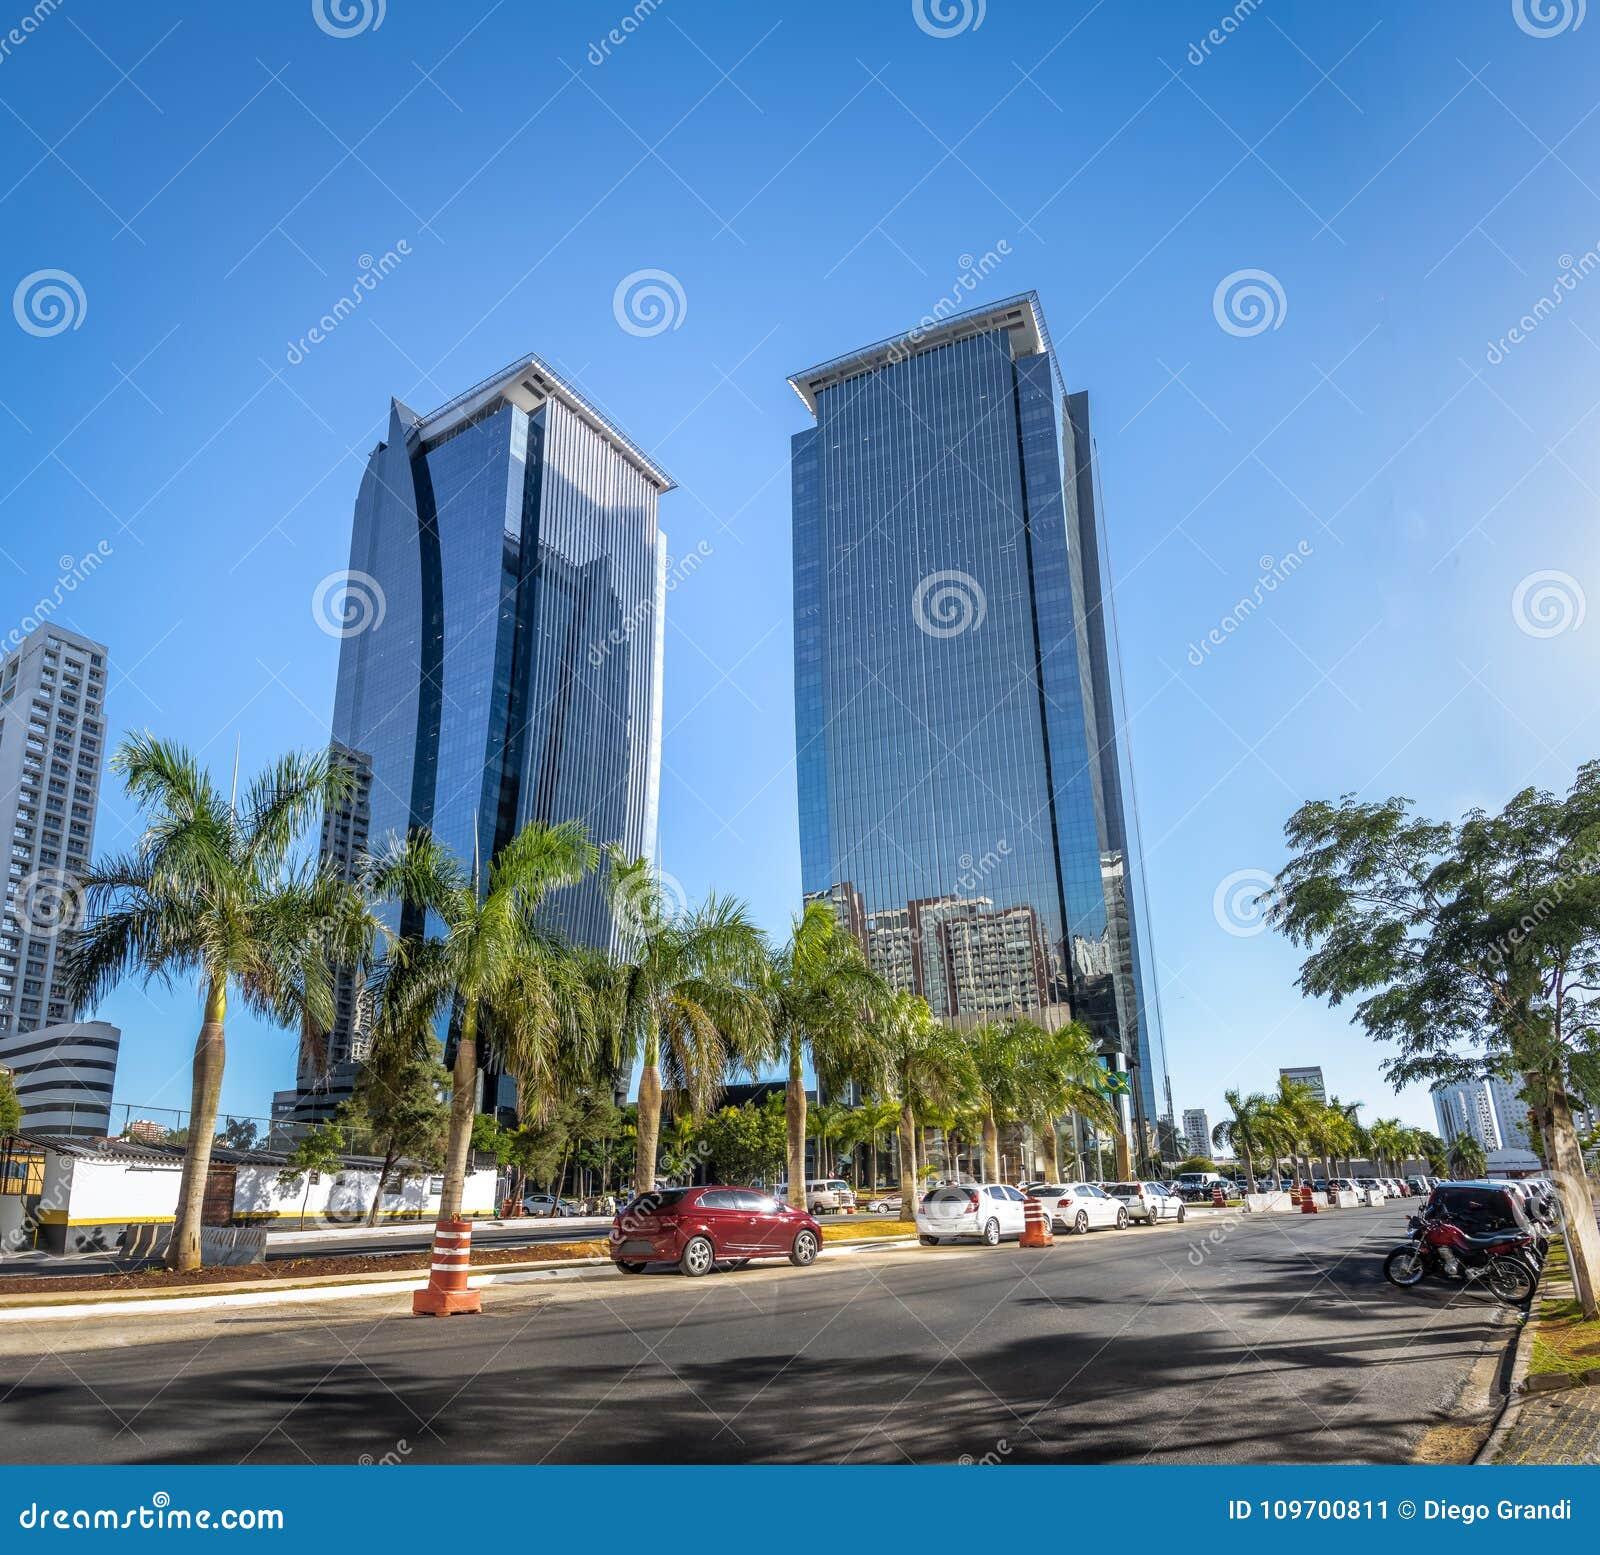 Buildings at Morumbi neighborhood in Sao Paulo financial district - Sao Paulo, Brazil